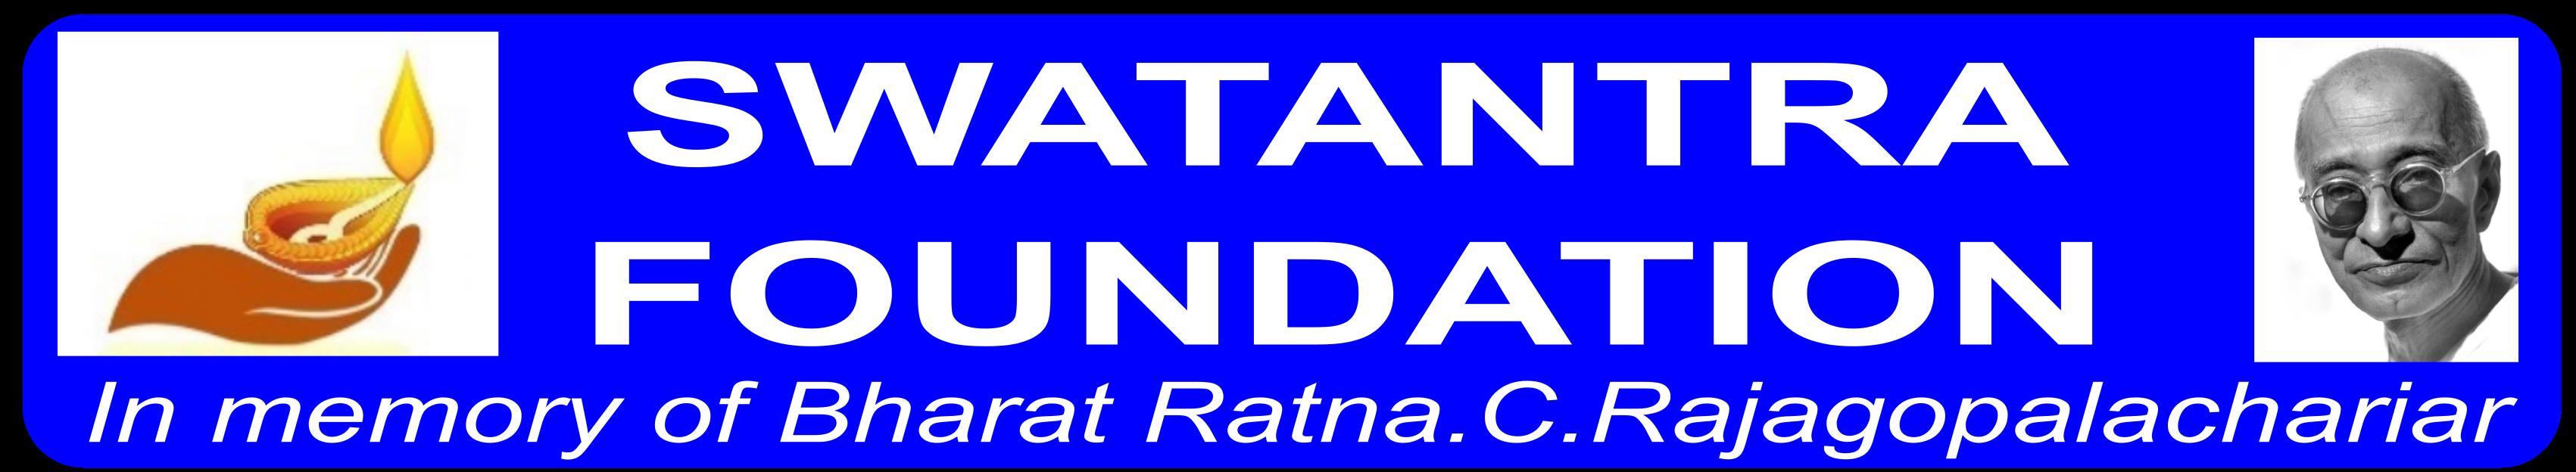 SWATANTRA FOUNDATION